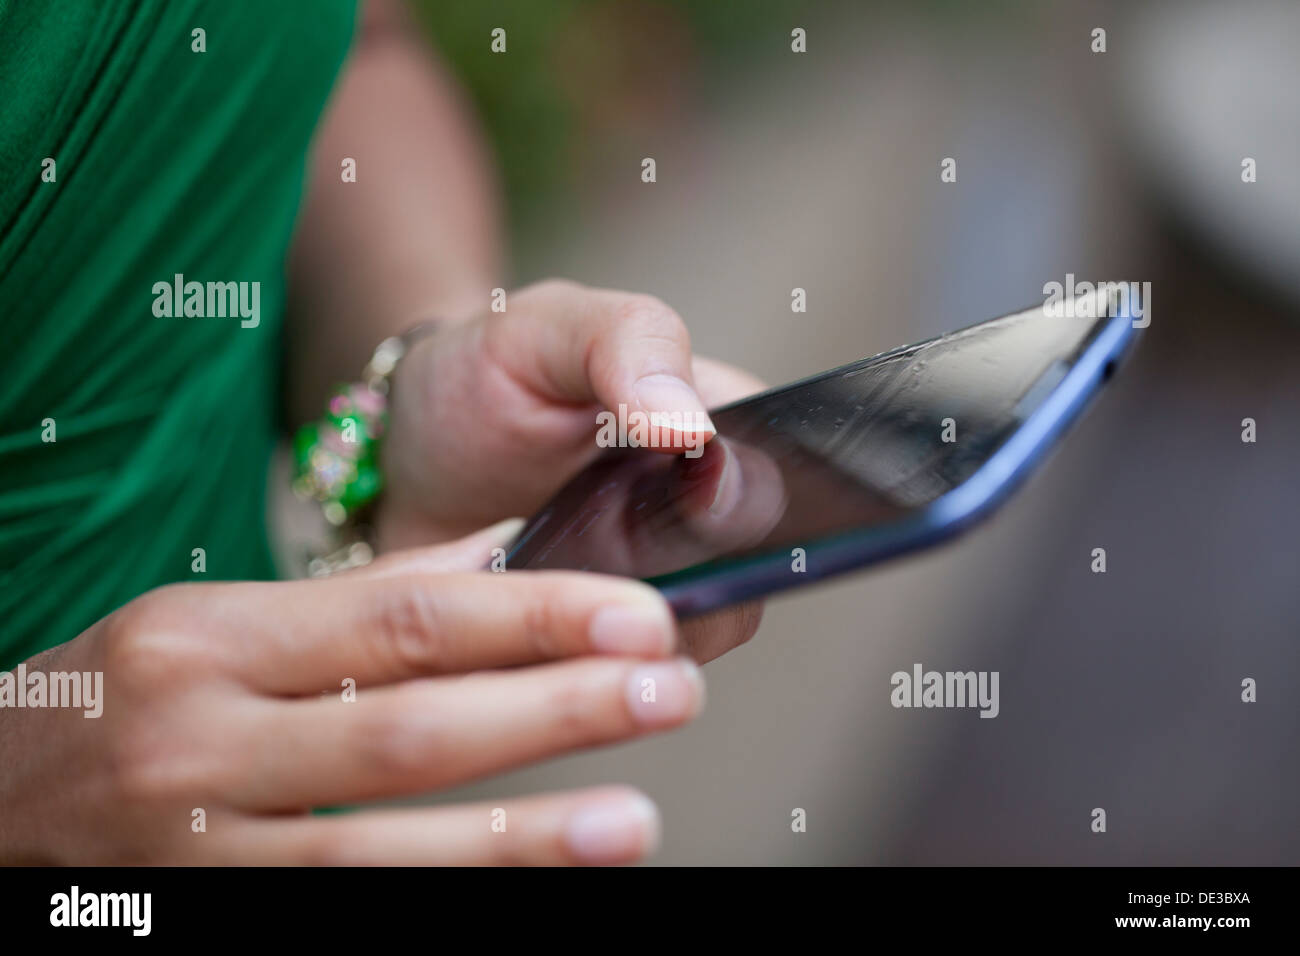 Closeup of woman using smart phone - Stock Image